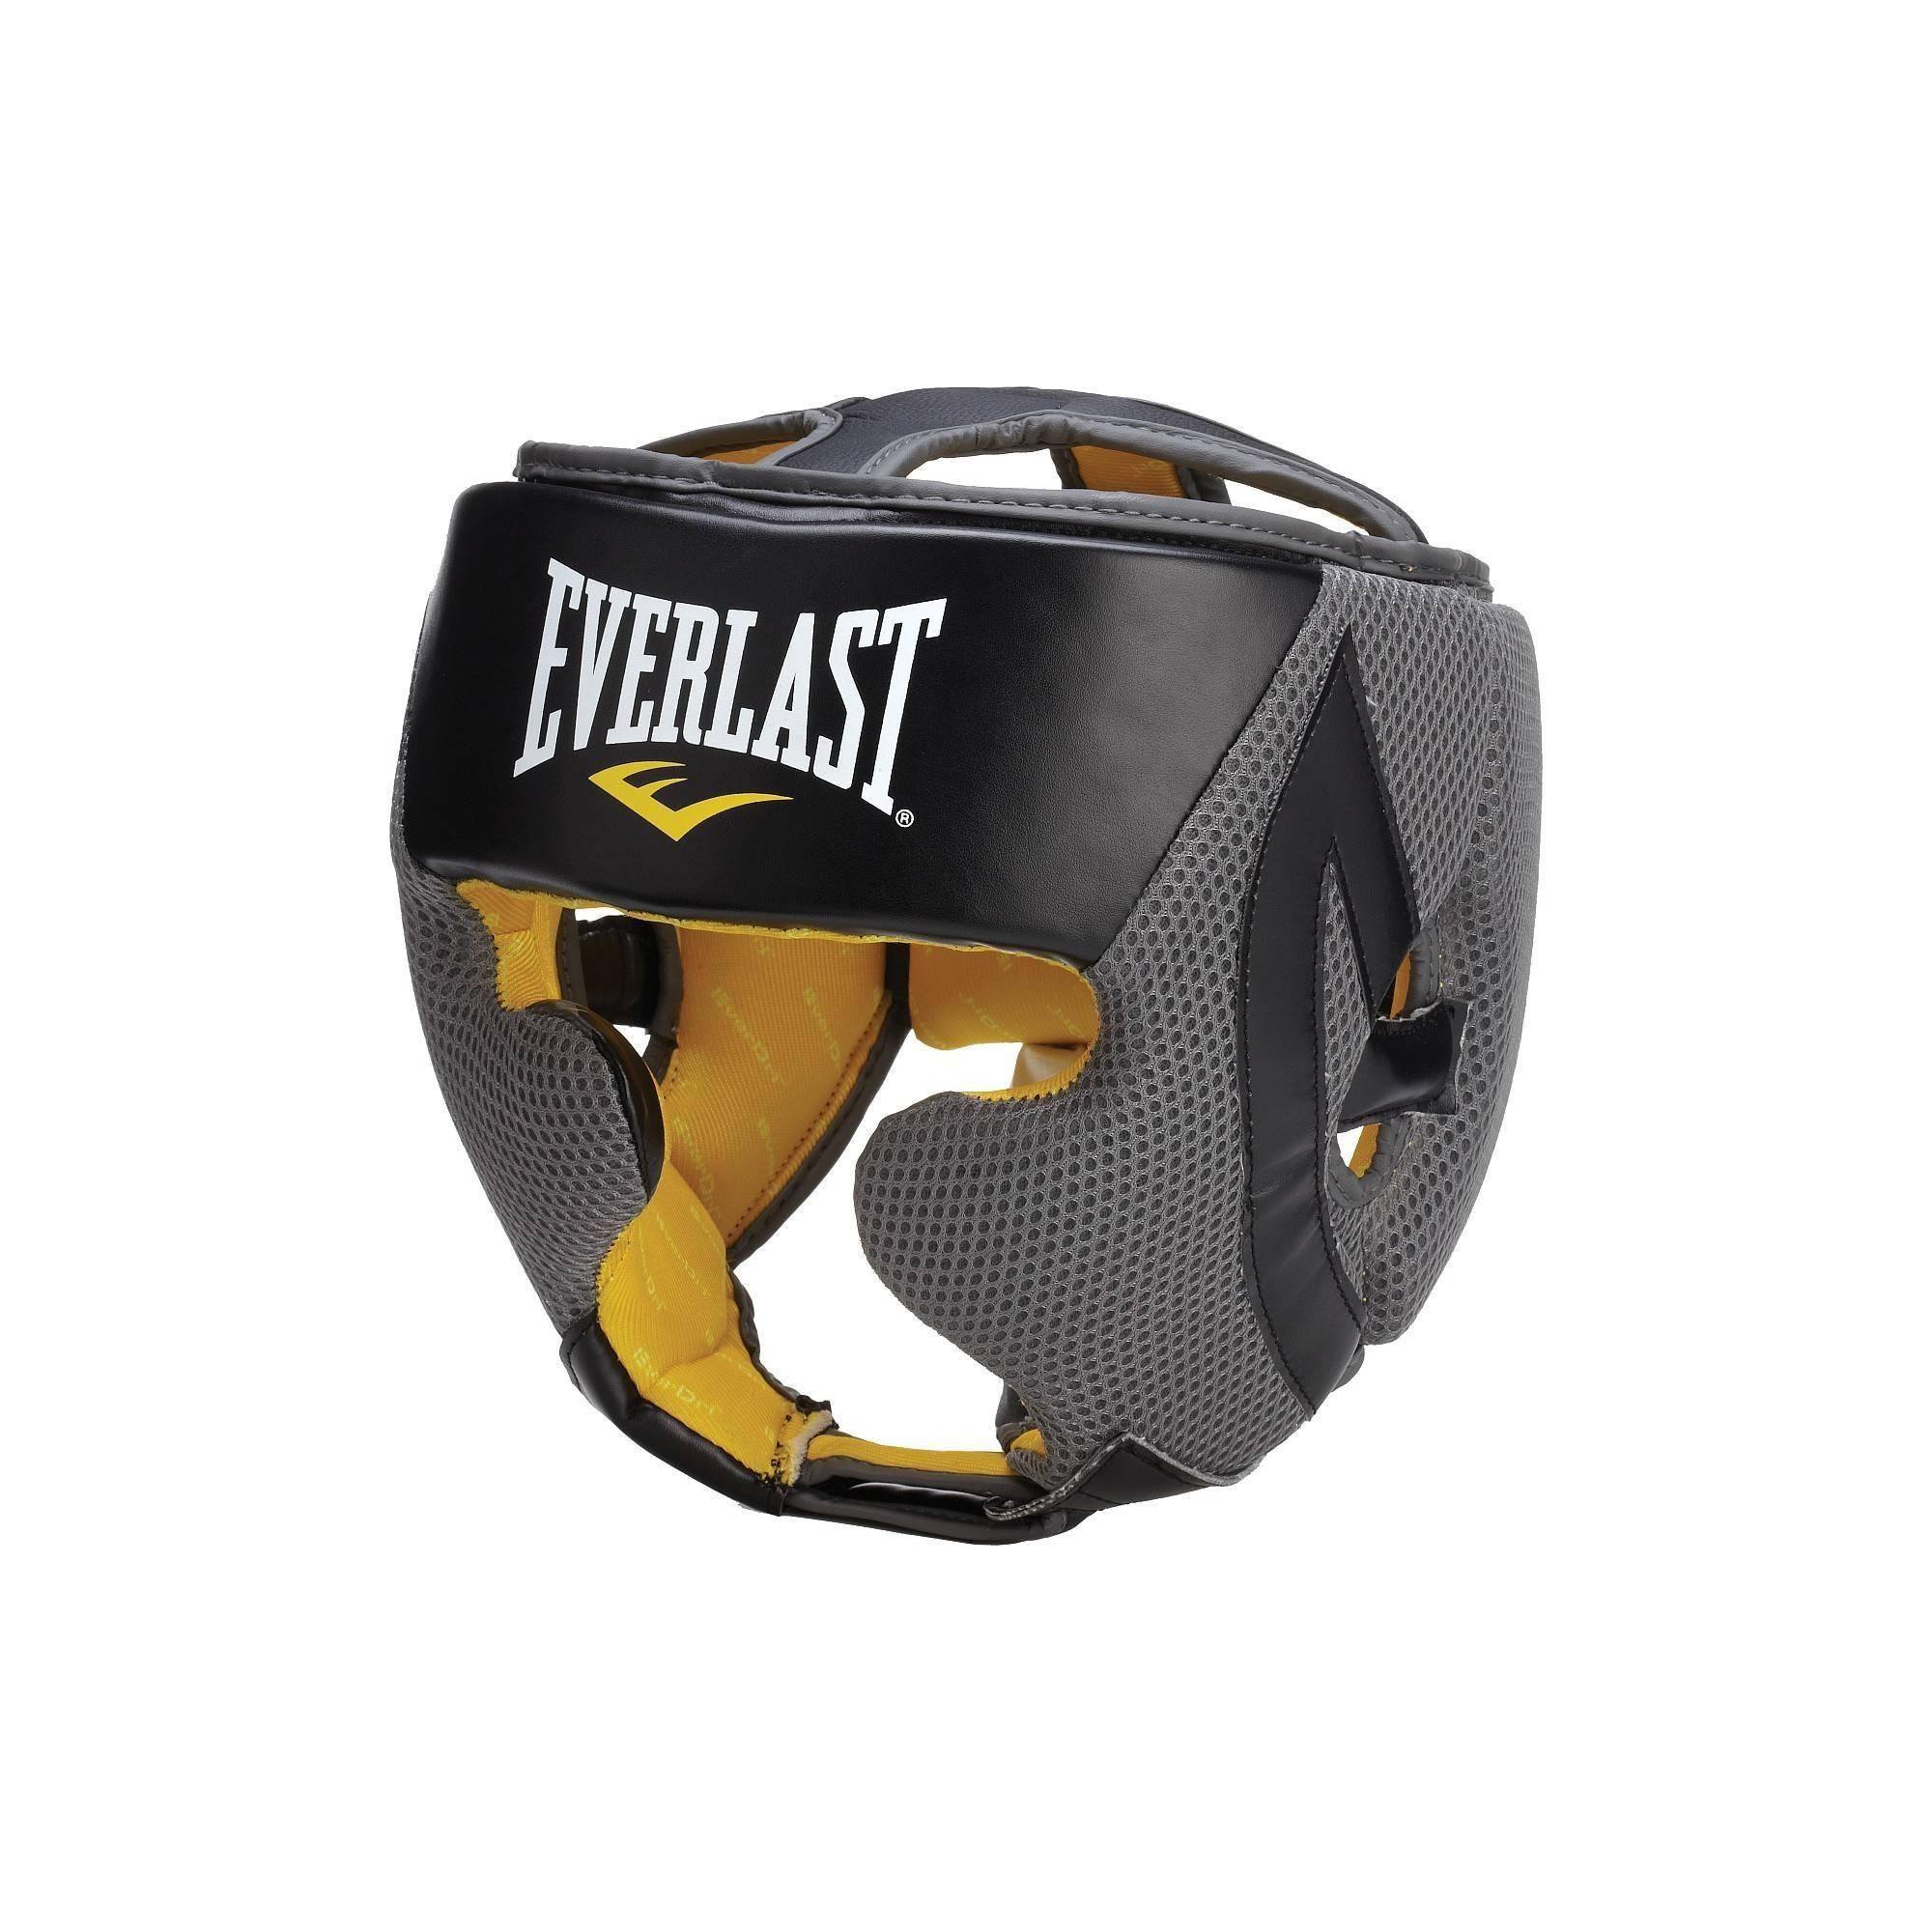 Kask bokserski treningowy Everlast Evercool level III | EVH4044,producent: Everlast, zdjecie photo: 1 | online shop klubfitness.